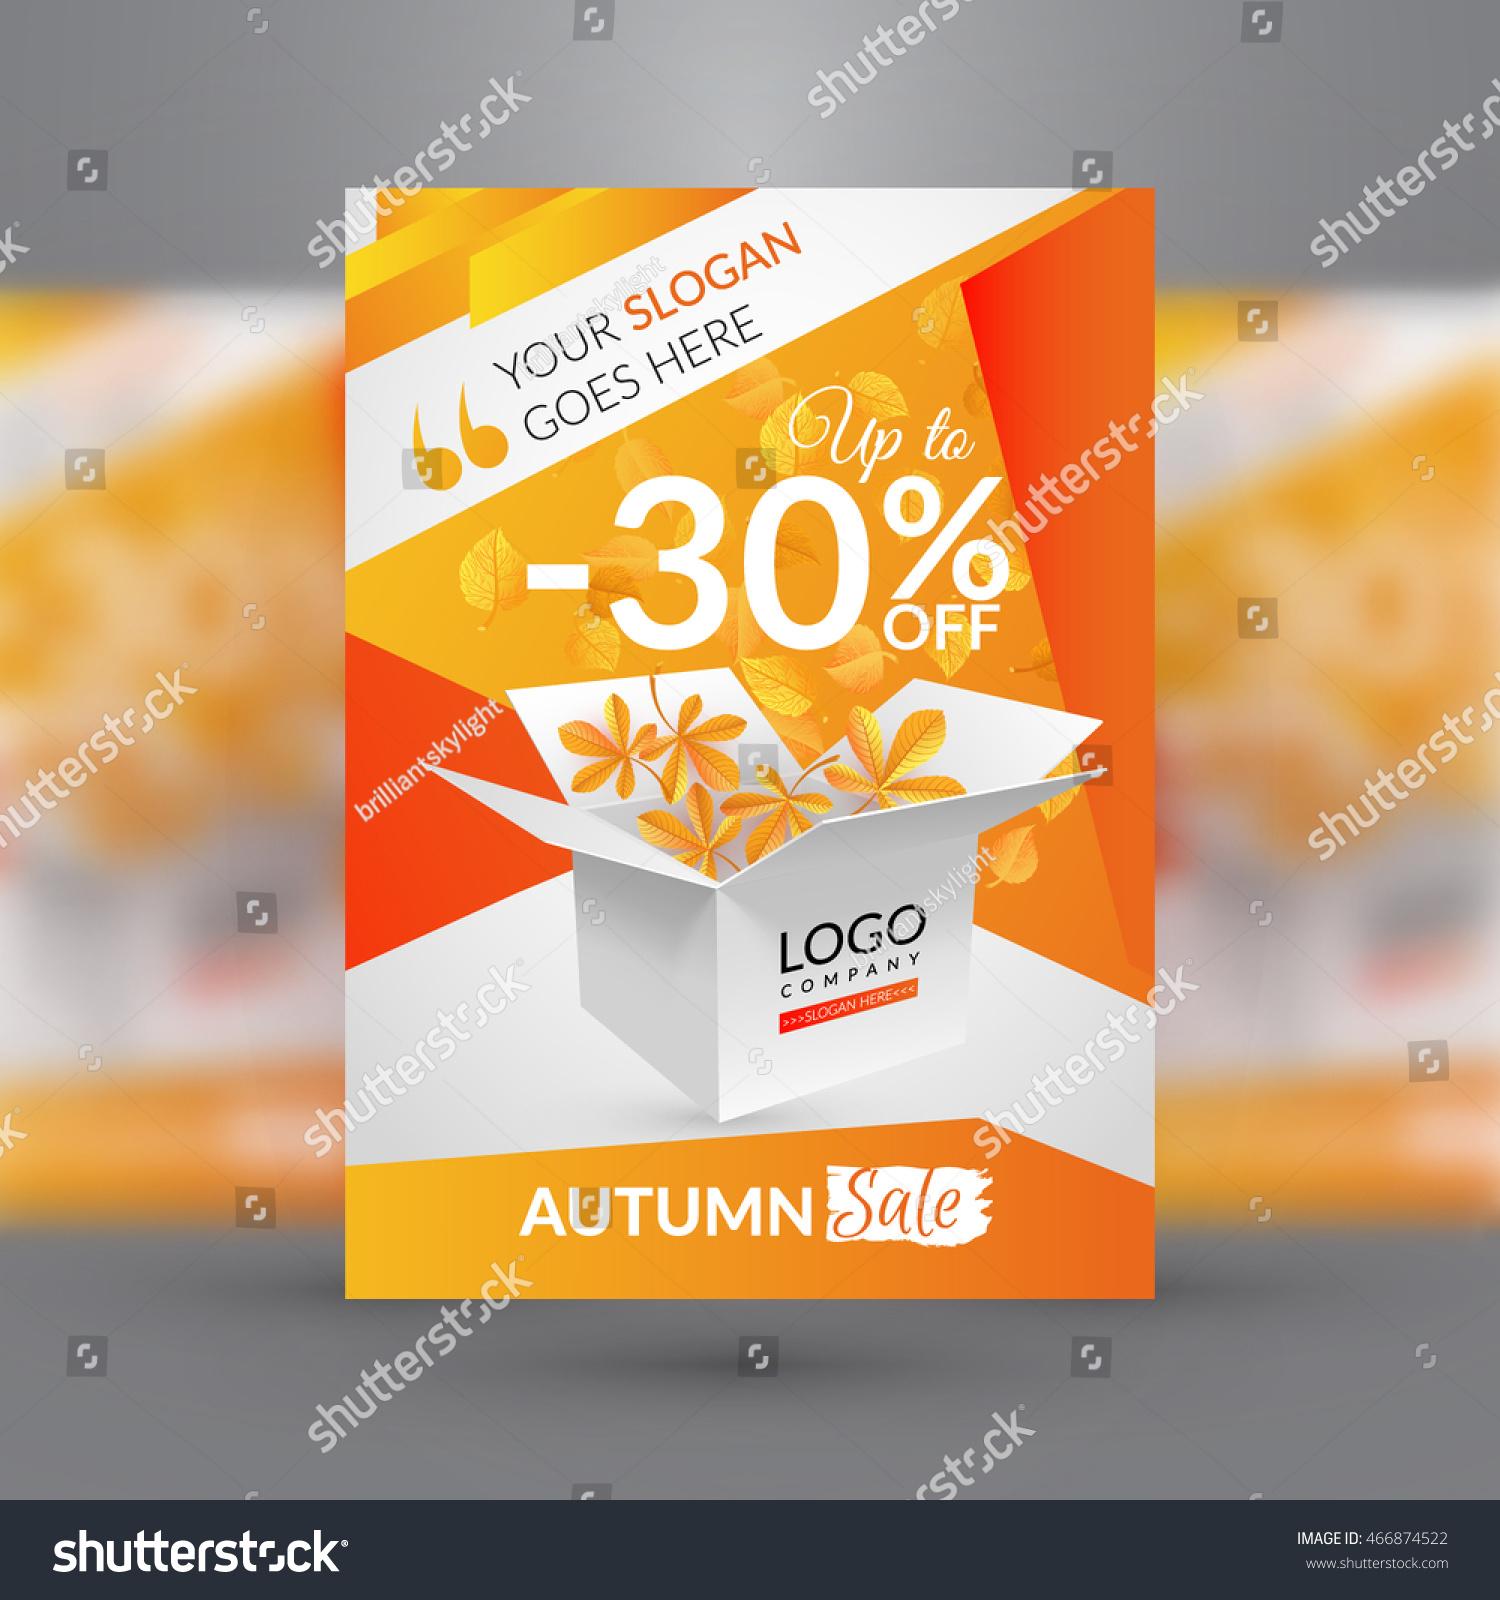 Autumn Sale Flyer Template Vector Illustration Vector – Sales Flyer Template